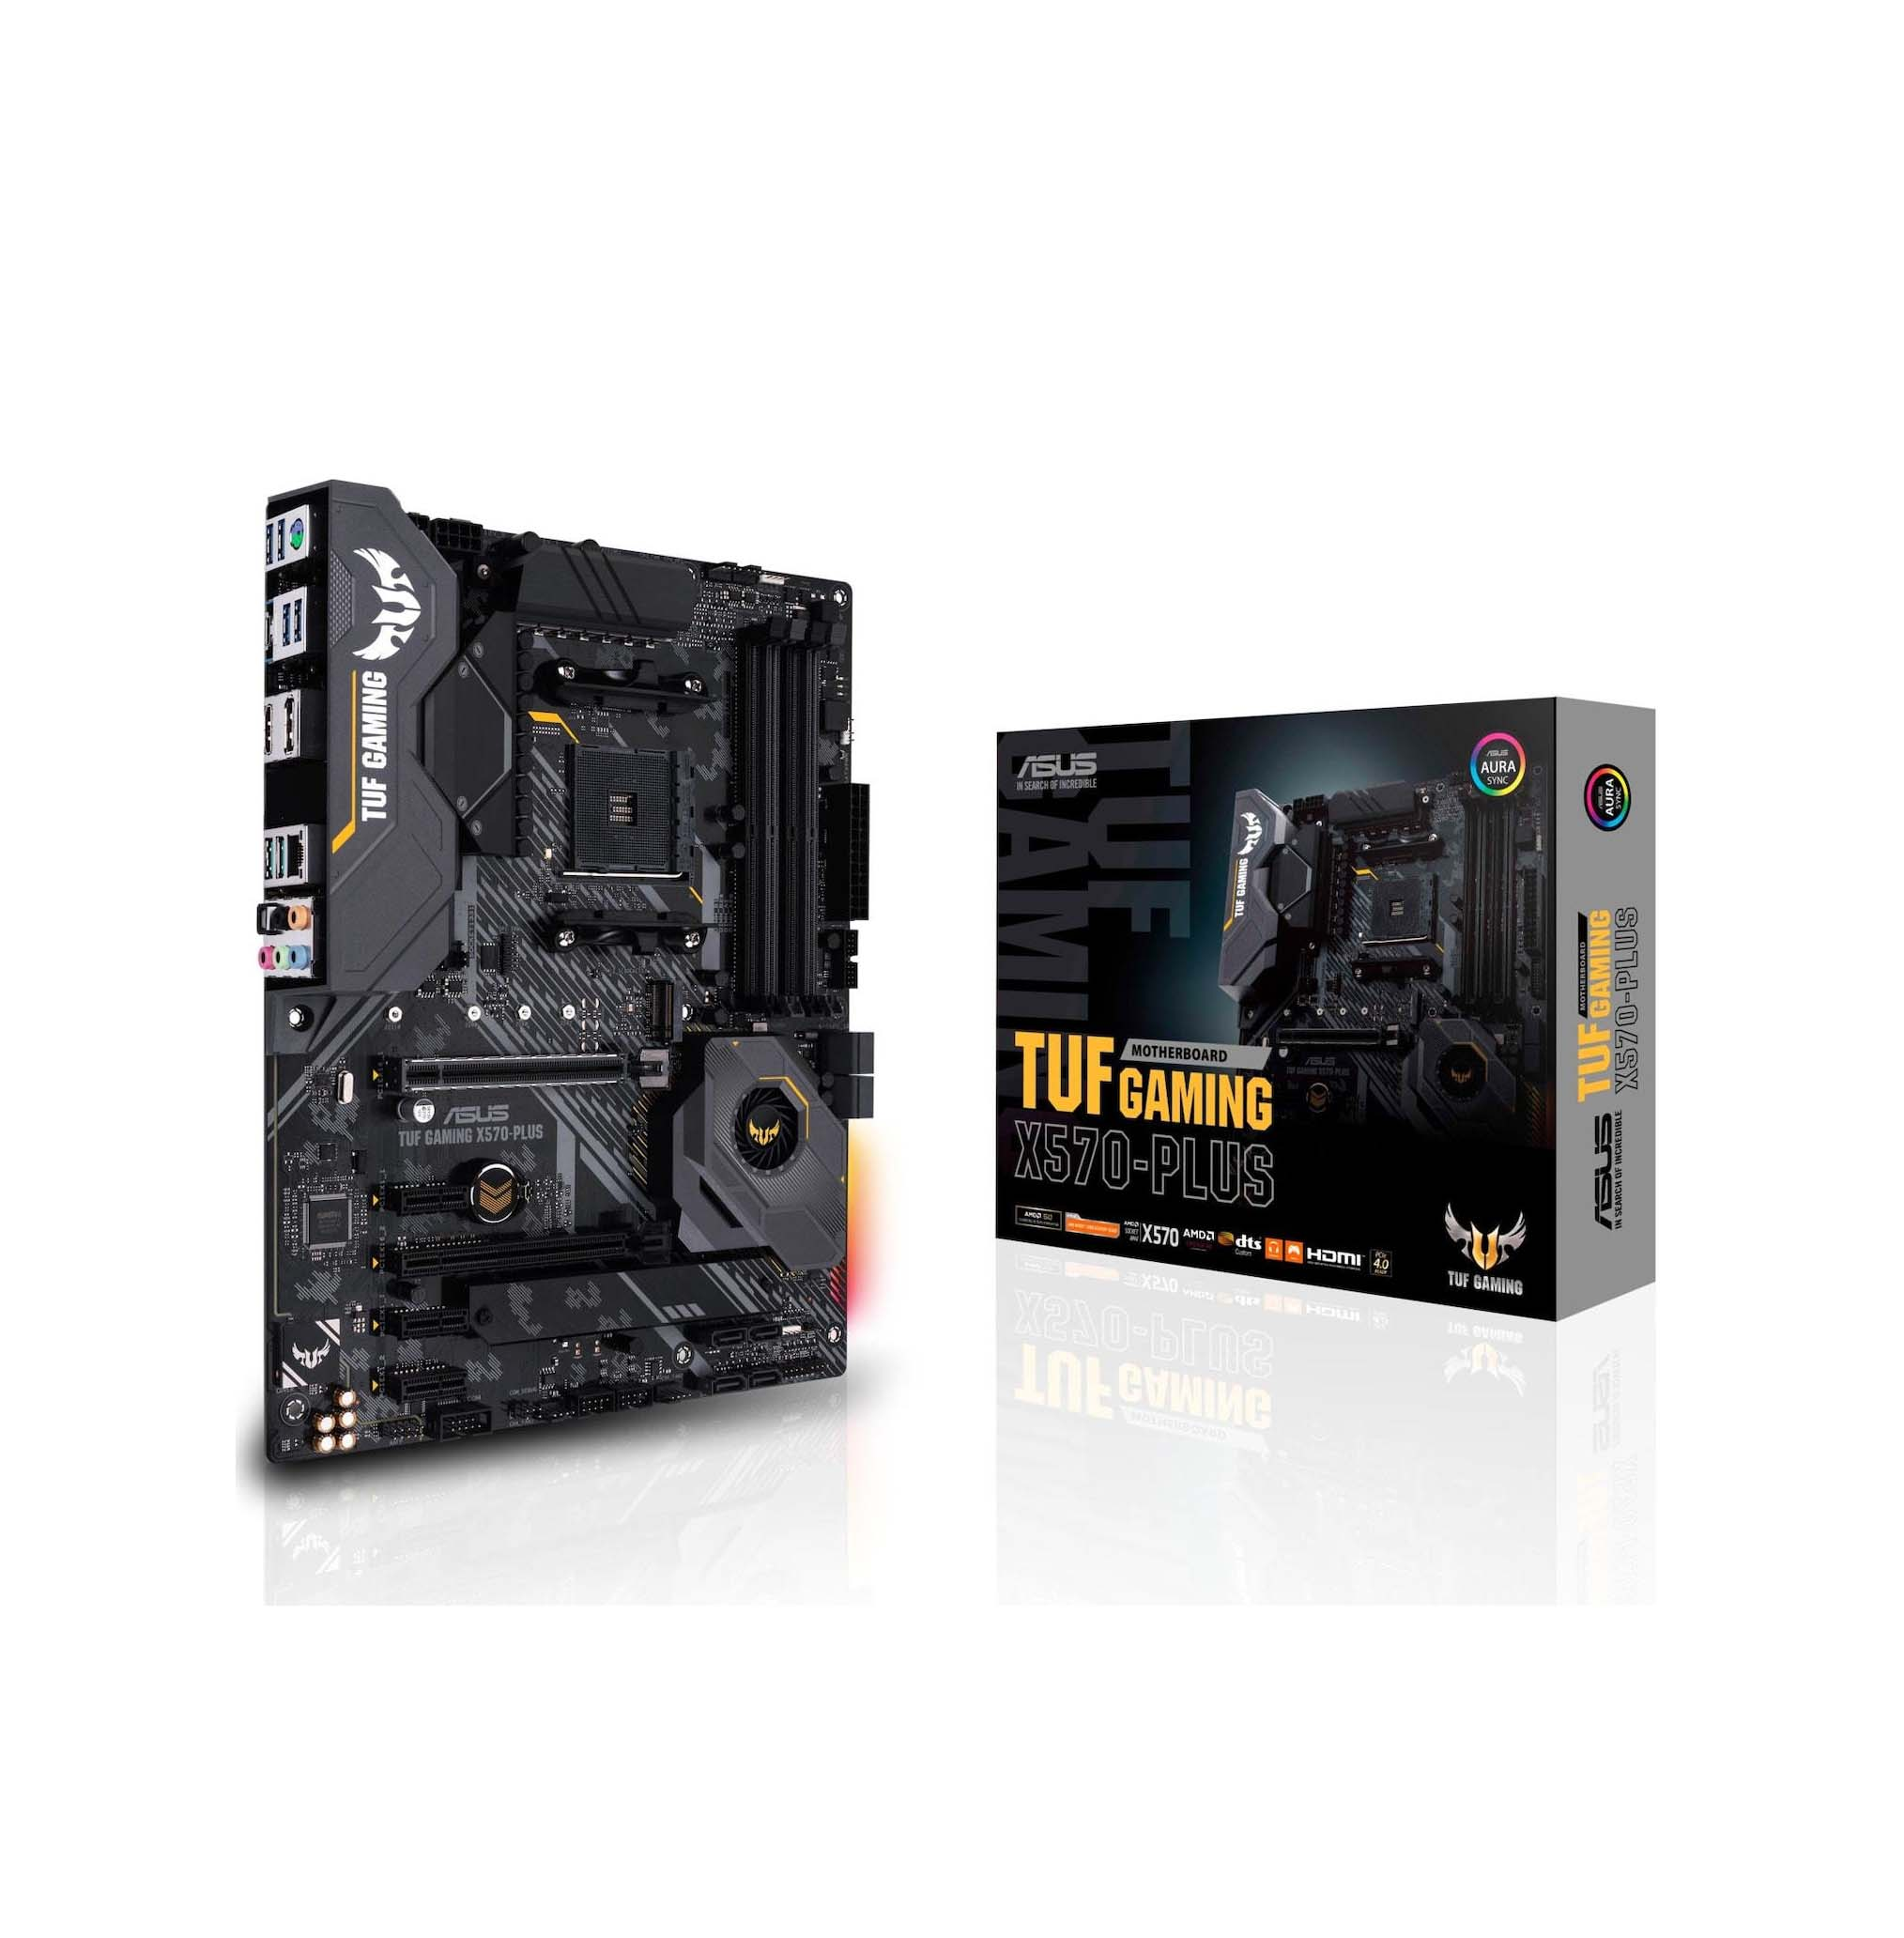 Asus TUF Gaming X570-Plus Μητρική Κάρτα 90MB1180-M0EAY0